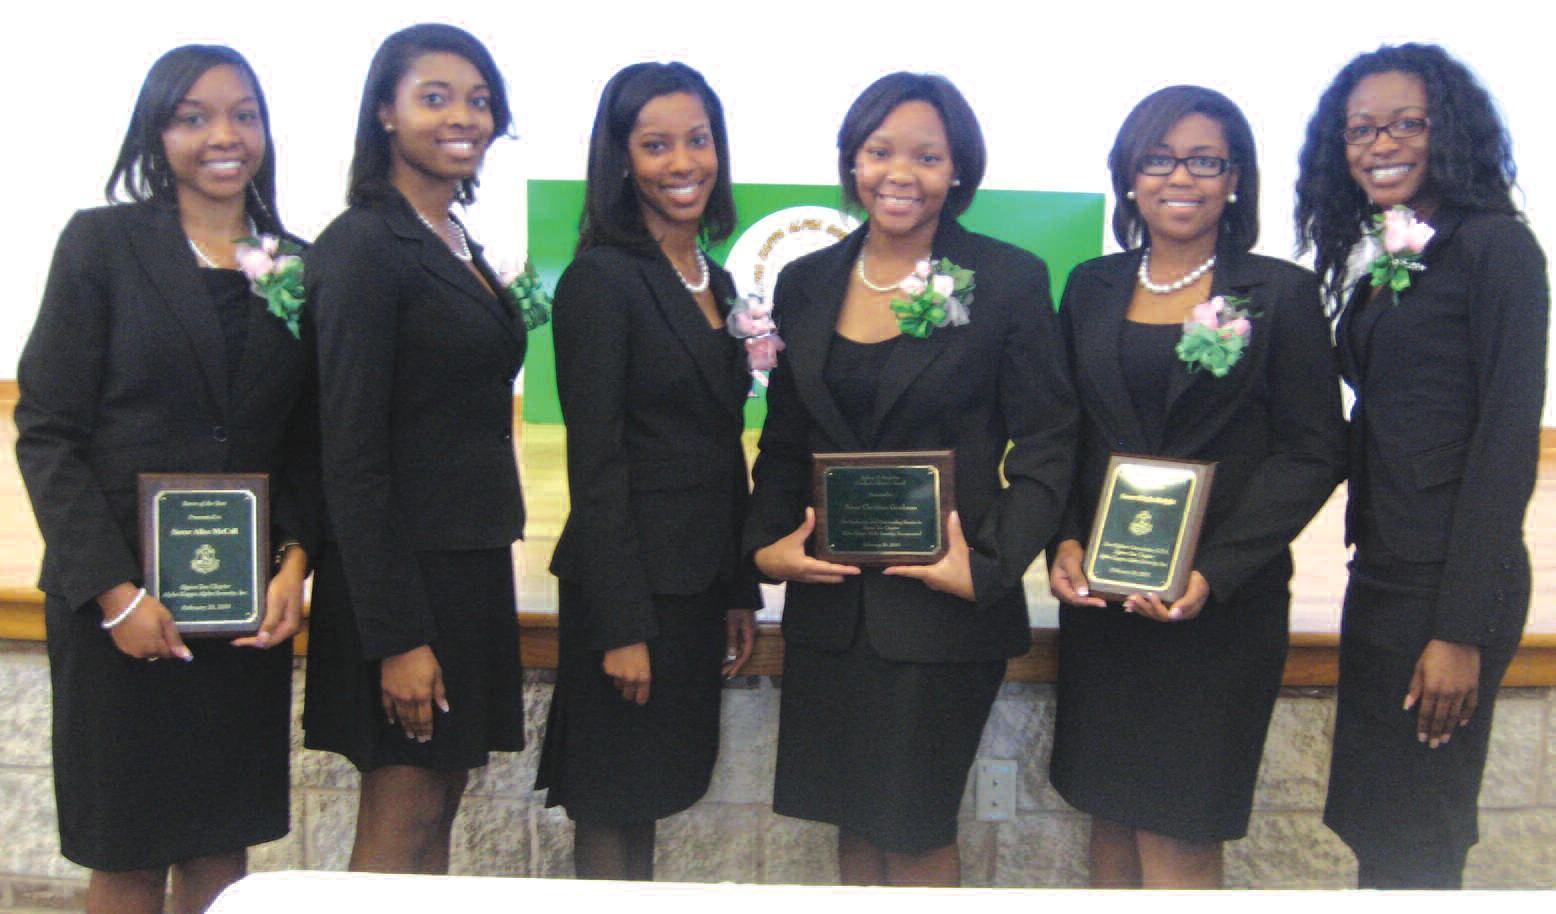 Members of Sigma Tau Chapter, Alpha Kappa Alpha, Sorority, Inc.